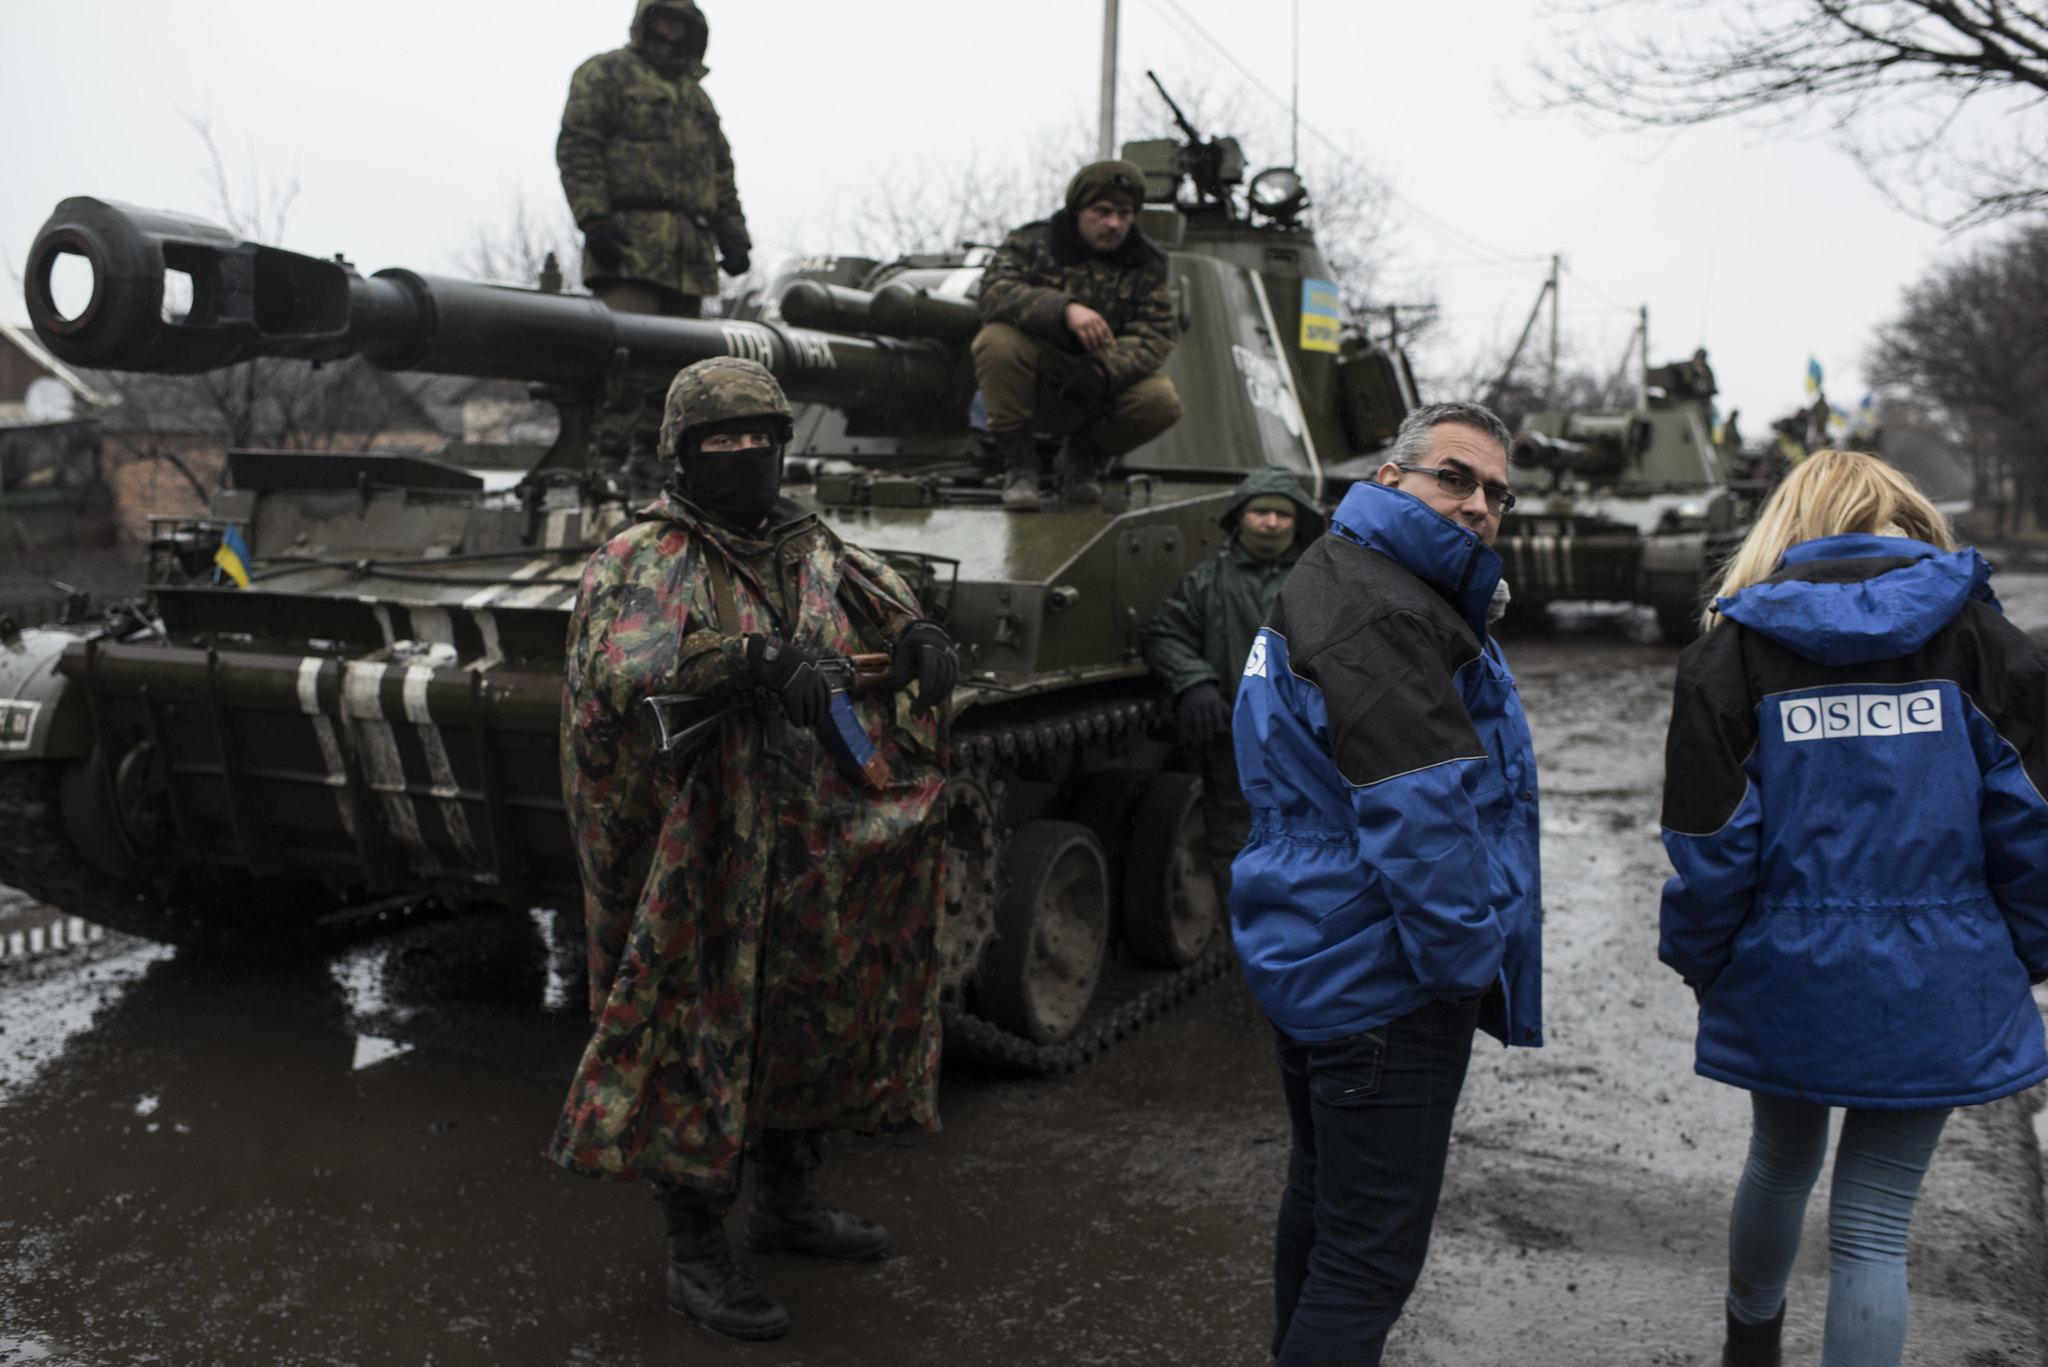 OSCE 烏克蘭特別觀察團檢視烏東重軍武裝備 圖/OSCE SMM (CC BY 2.0)